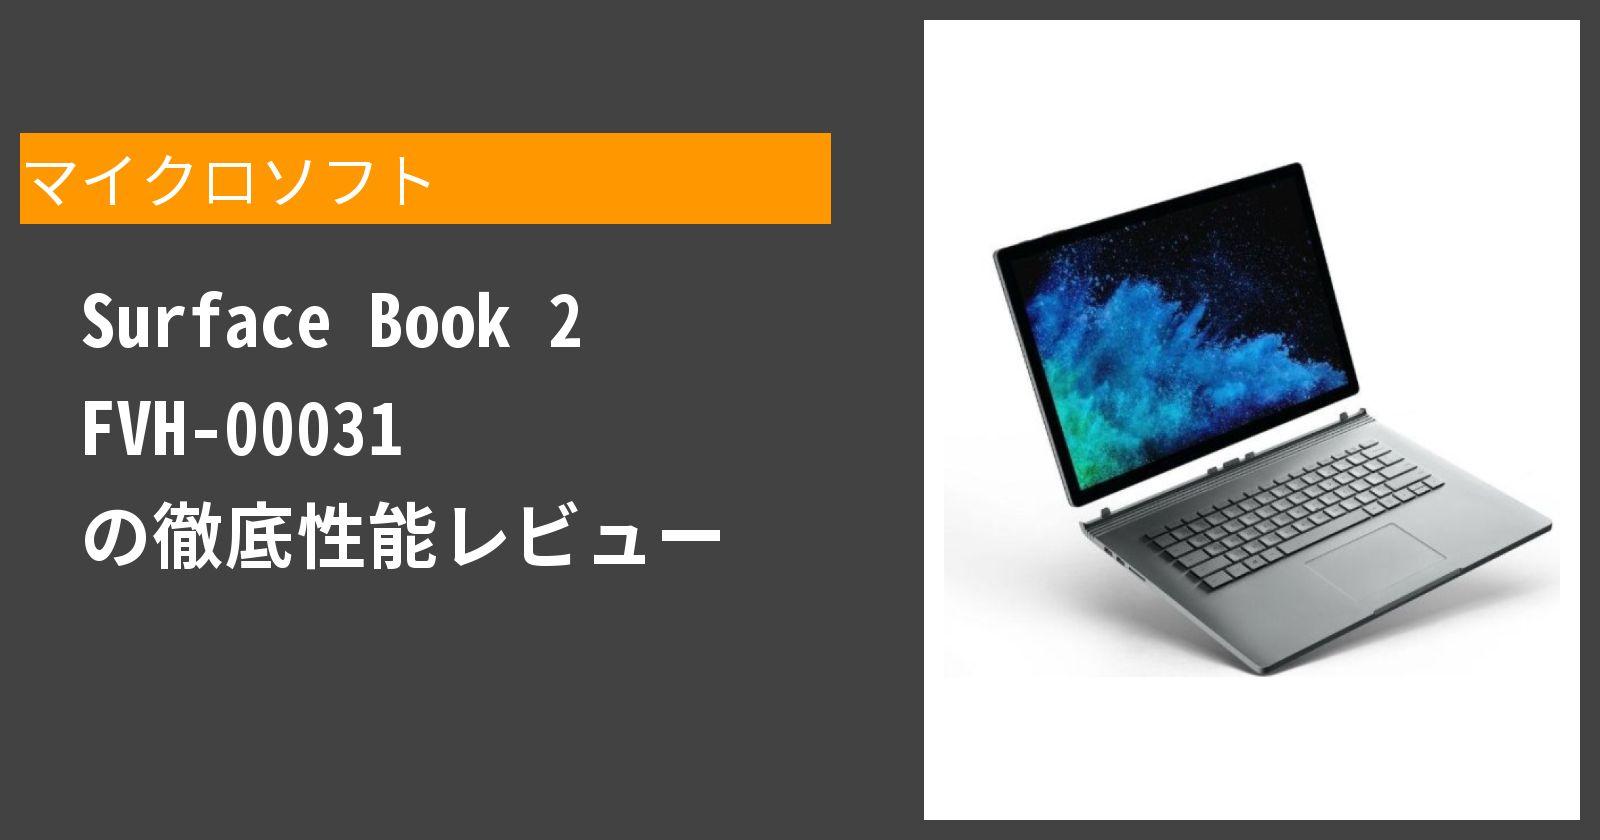 Surface Book 2 FVH-00031 の徹底性能レビュー